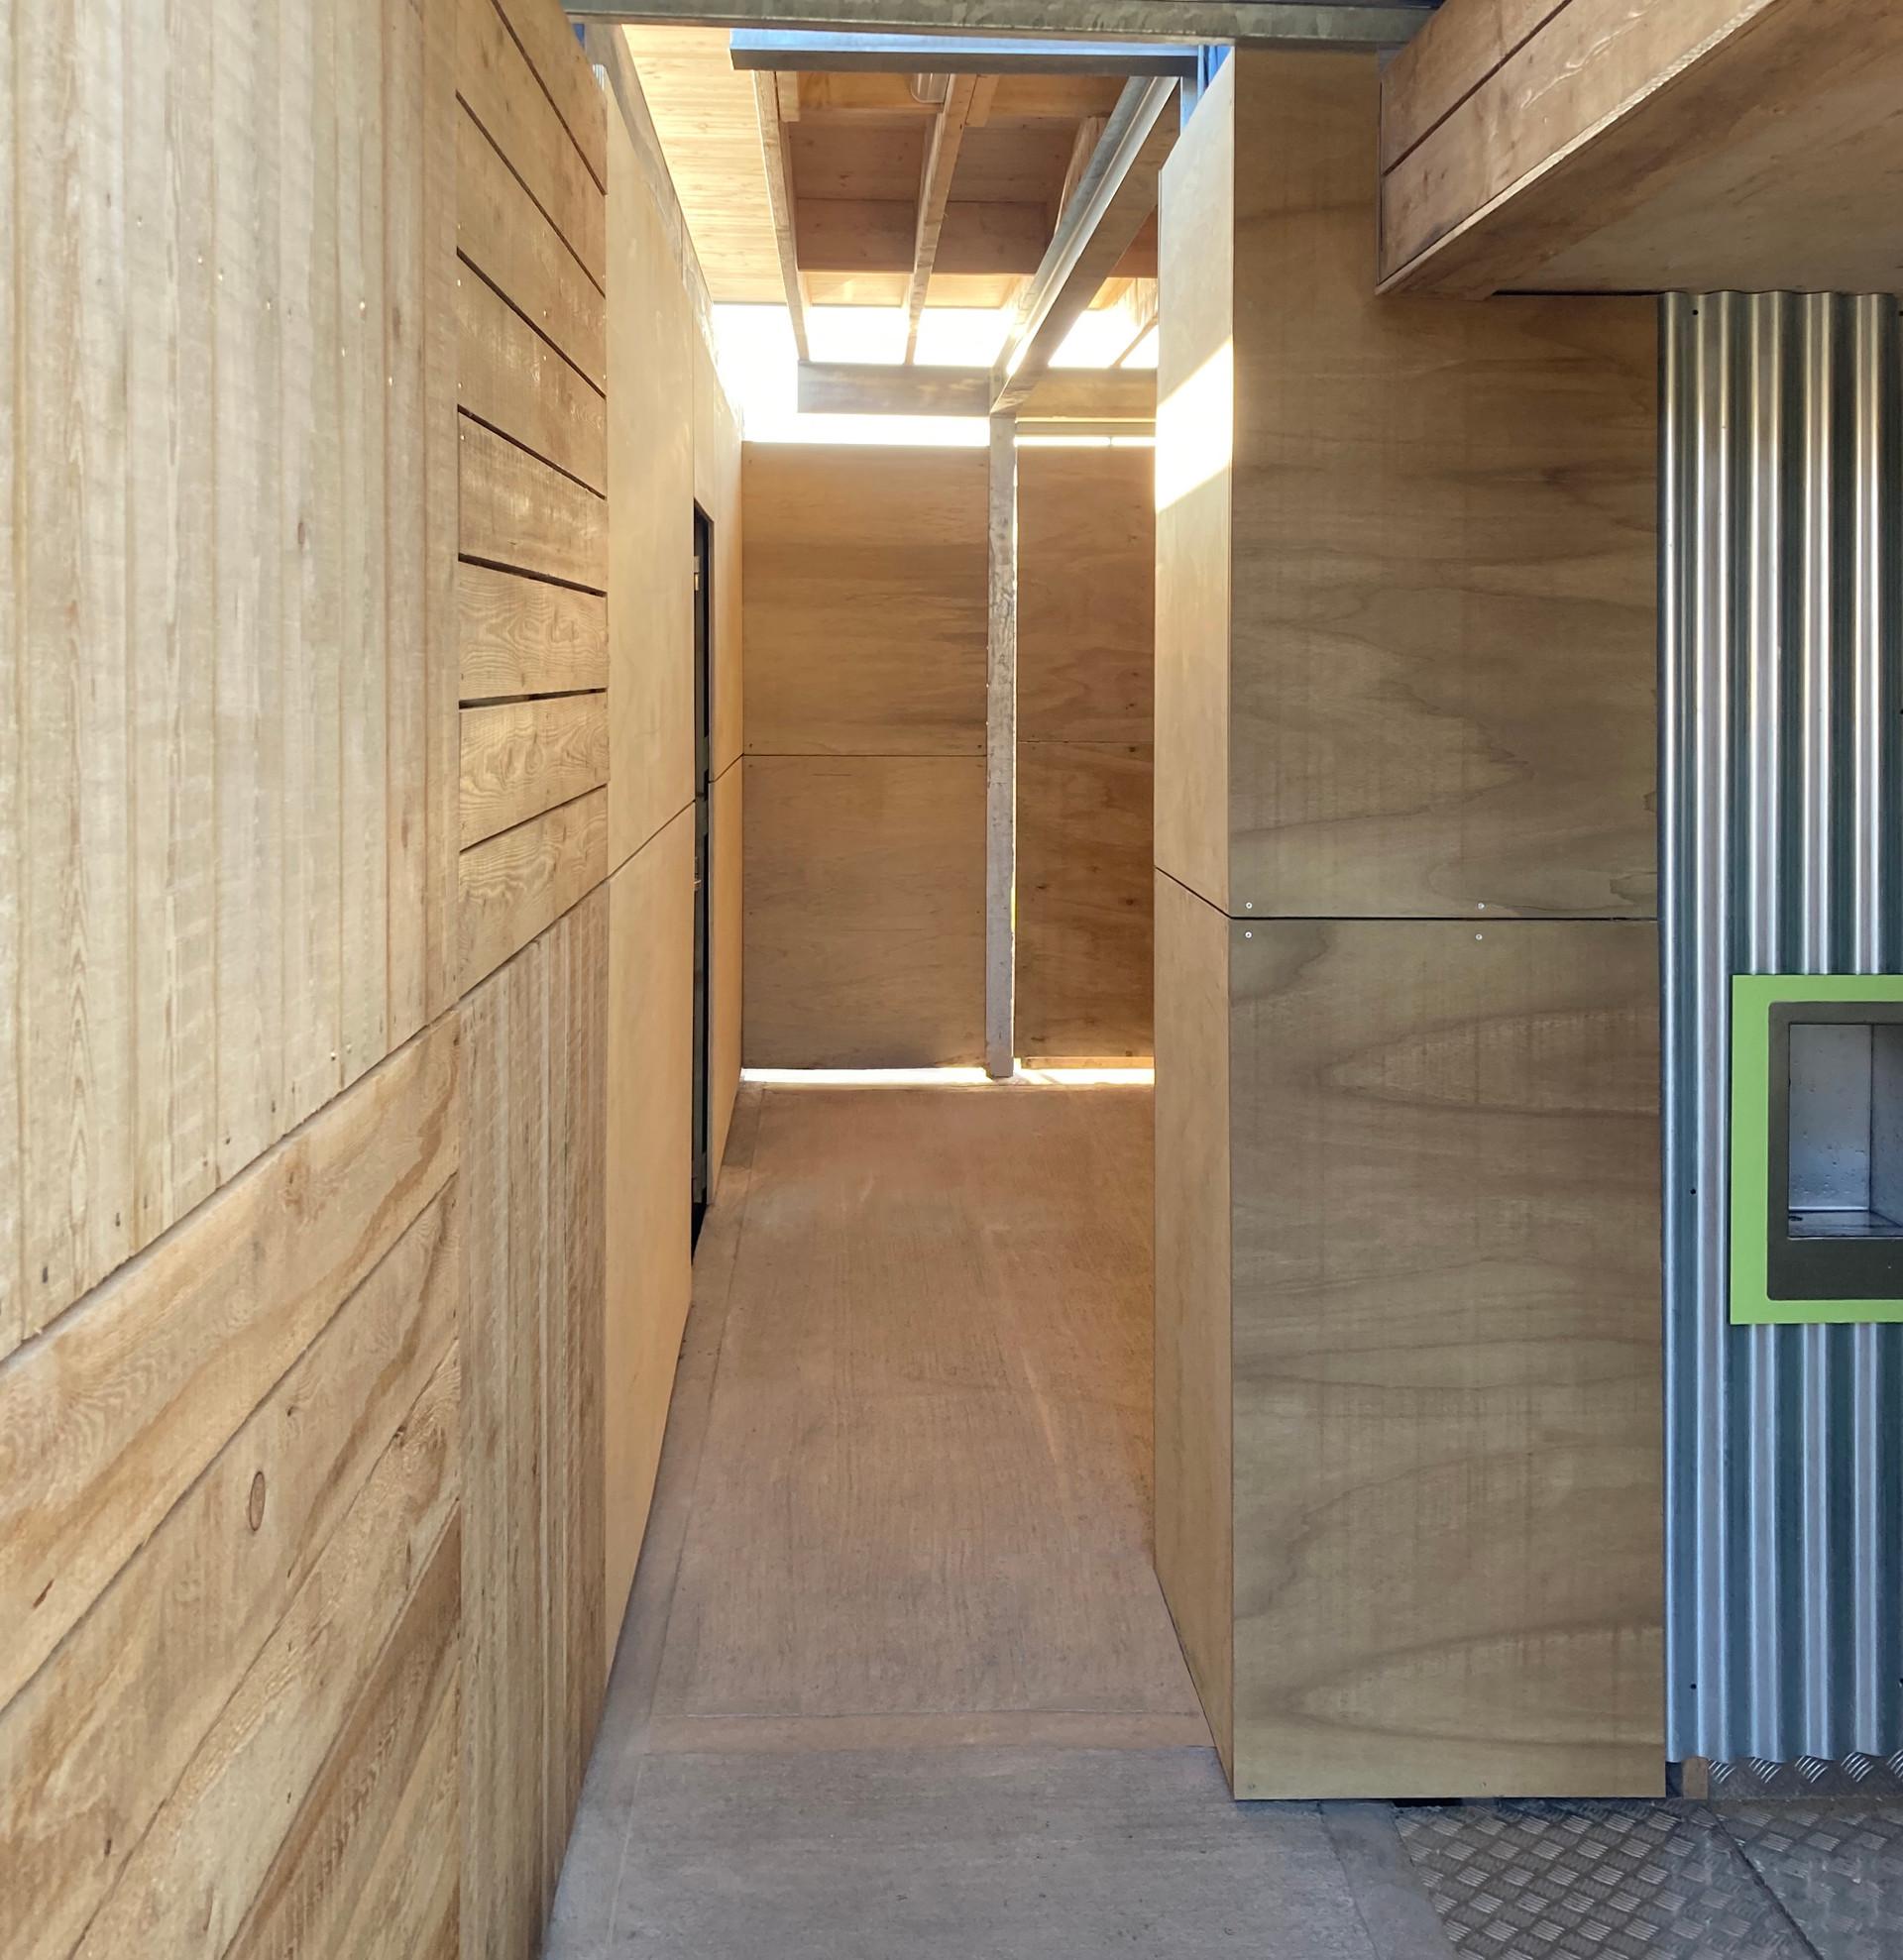 Coalface interior - to sliding doors